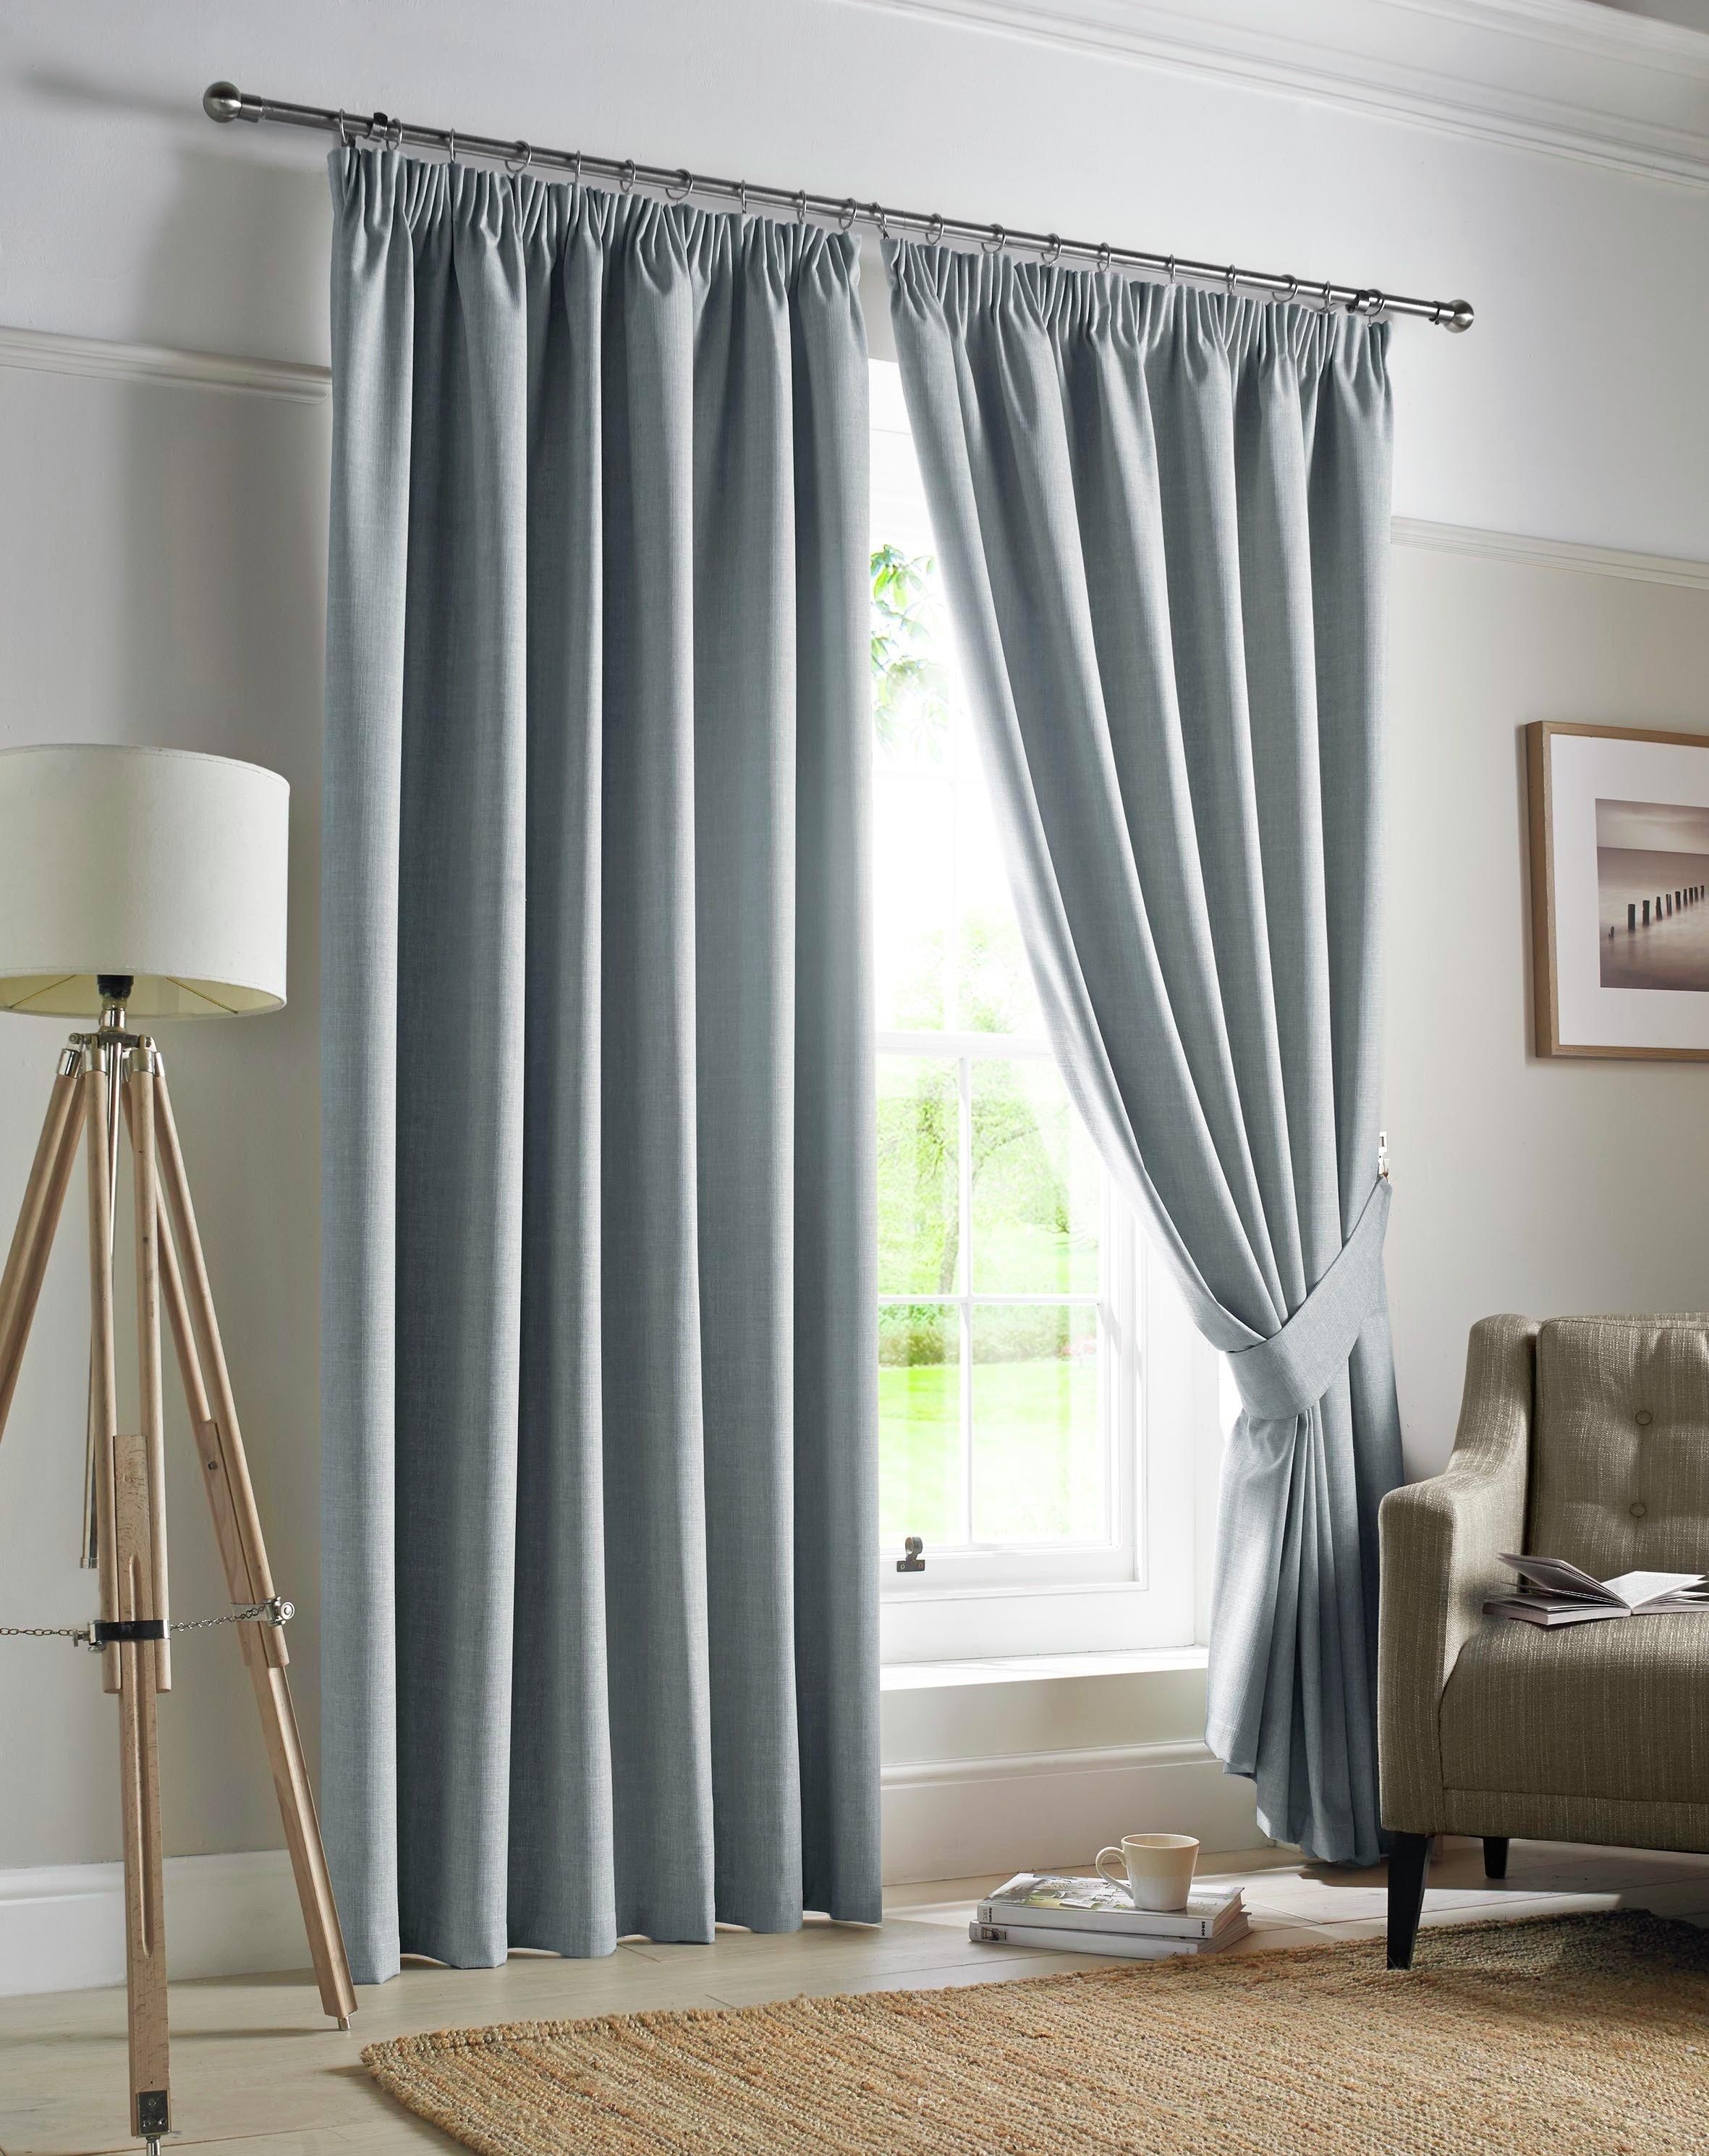 Image of Ashley Wilde Darwin Pencil Pleat Curtains - 117x183cm - Sky